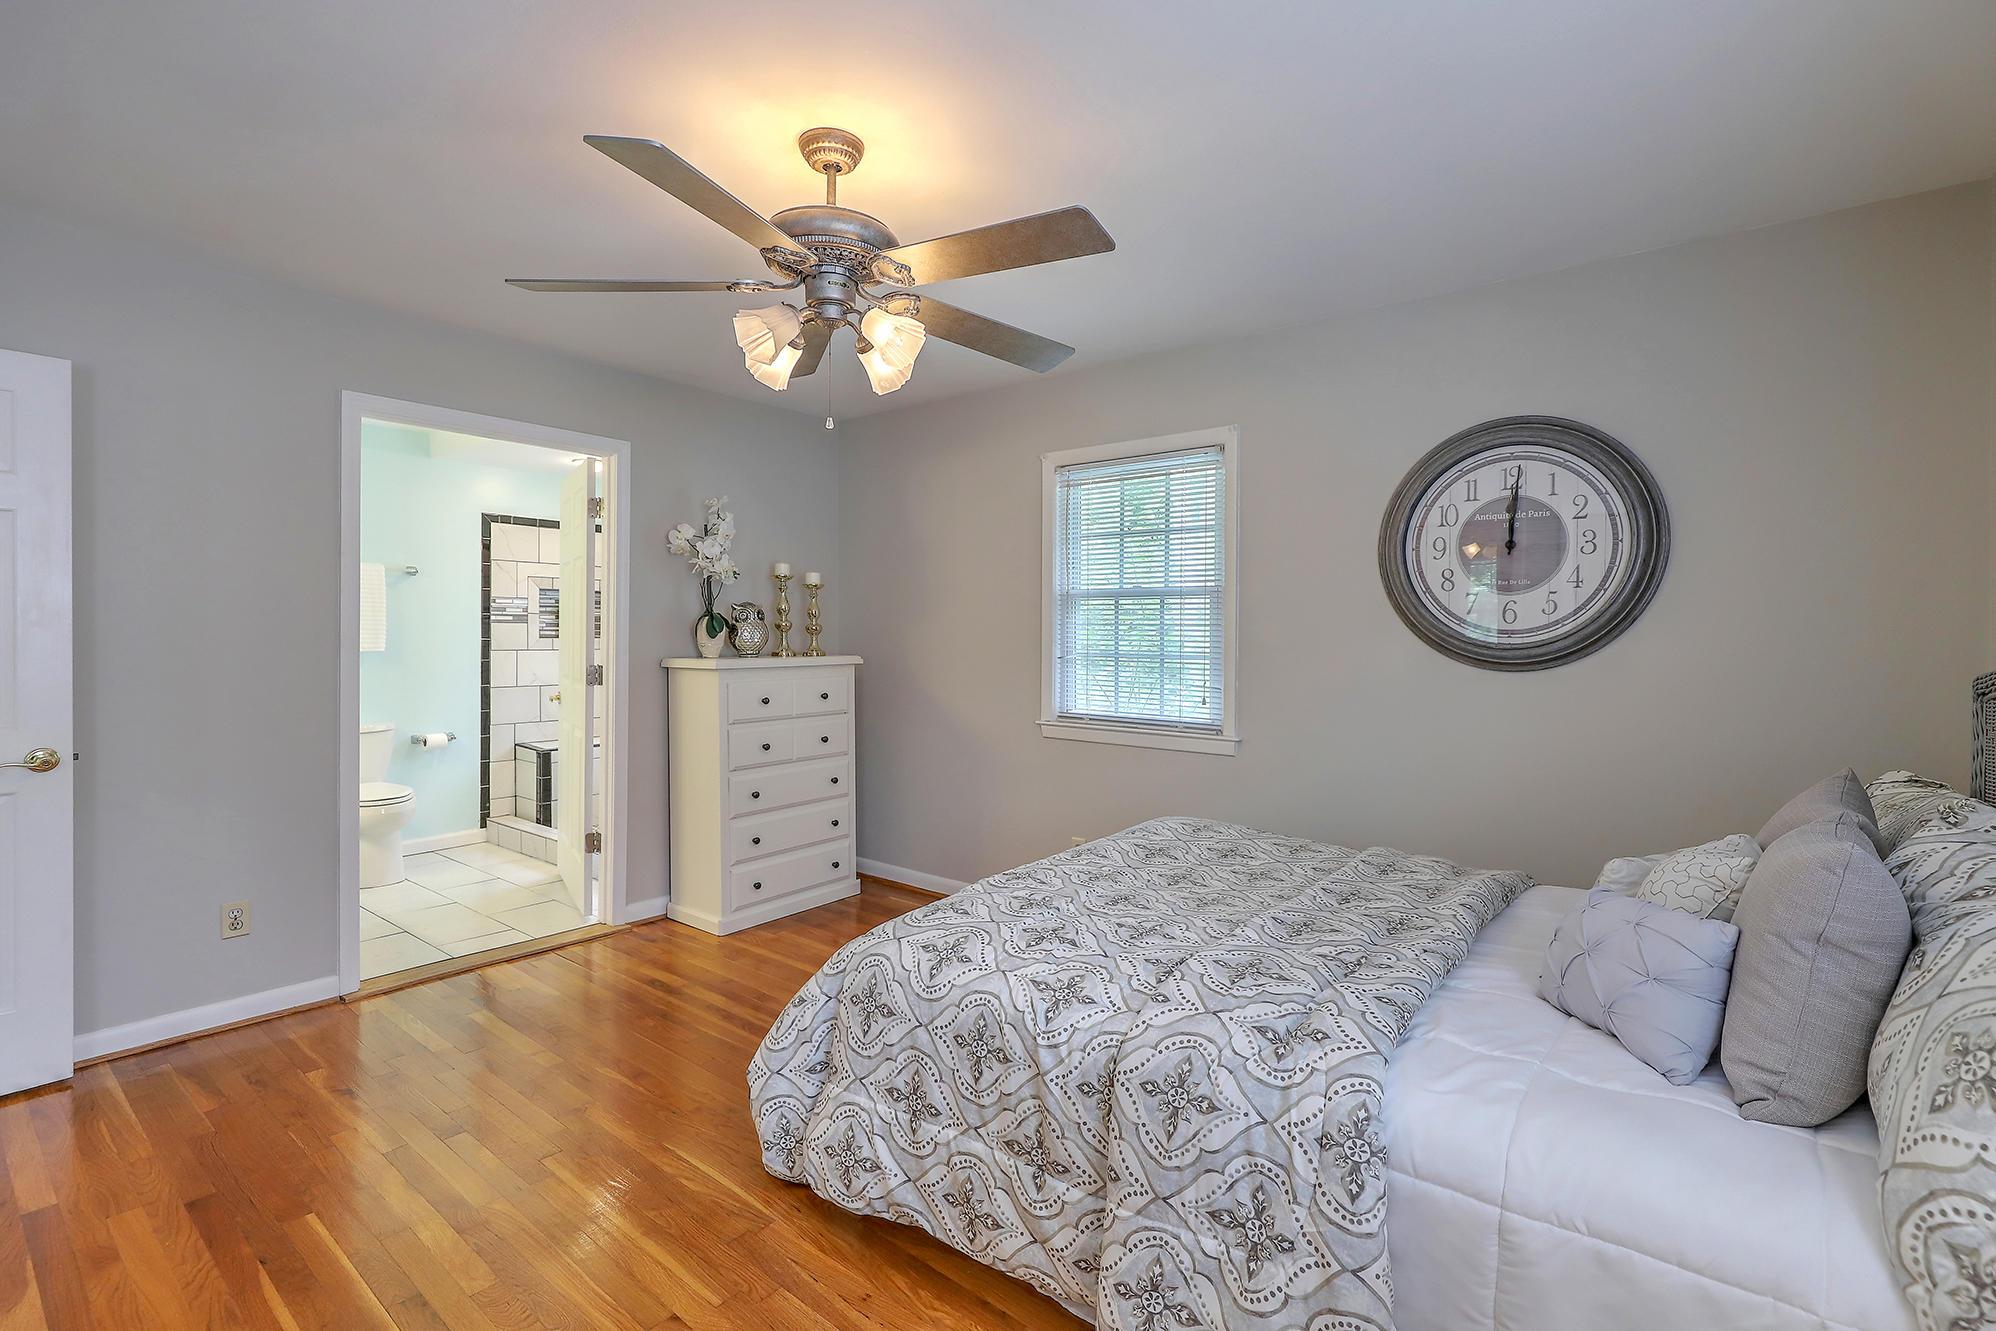 Charlestowne Estates III Homes For Sale - 1313 Coleridge, Charleston, SC - 18